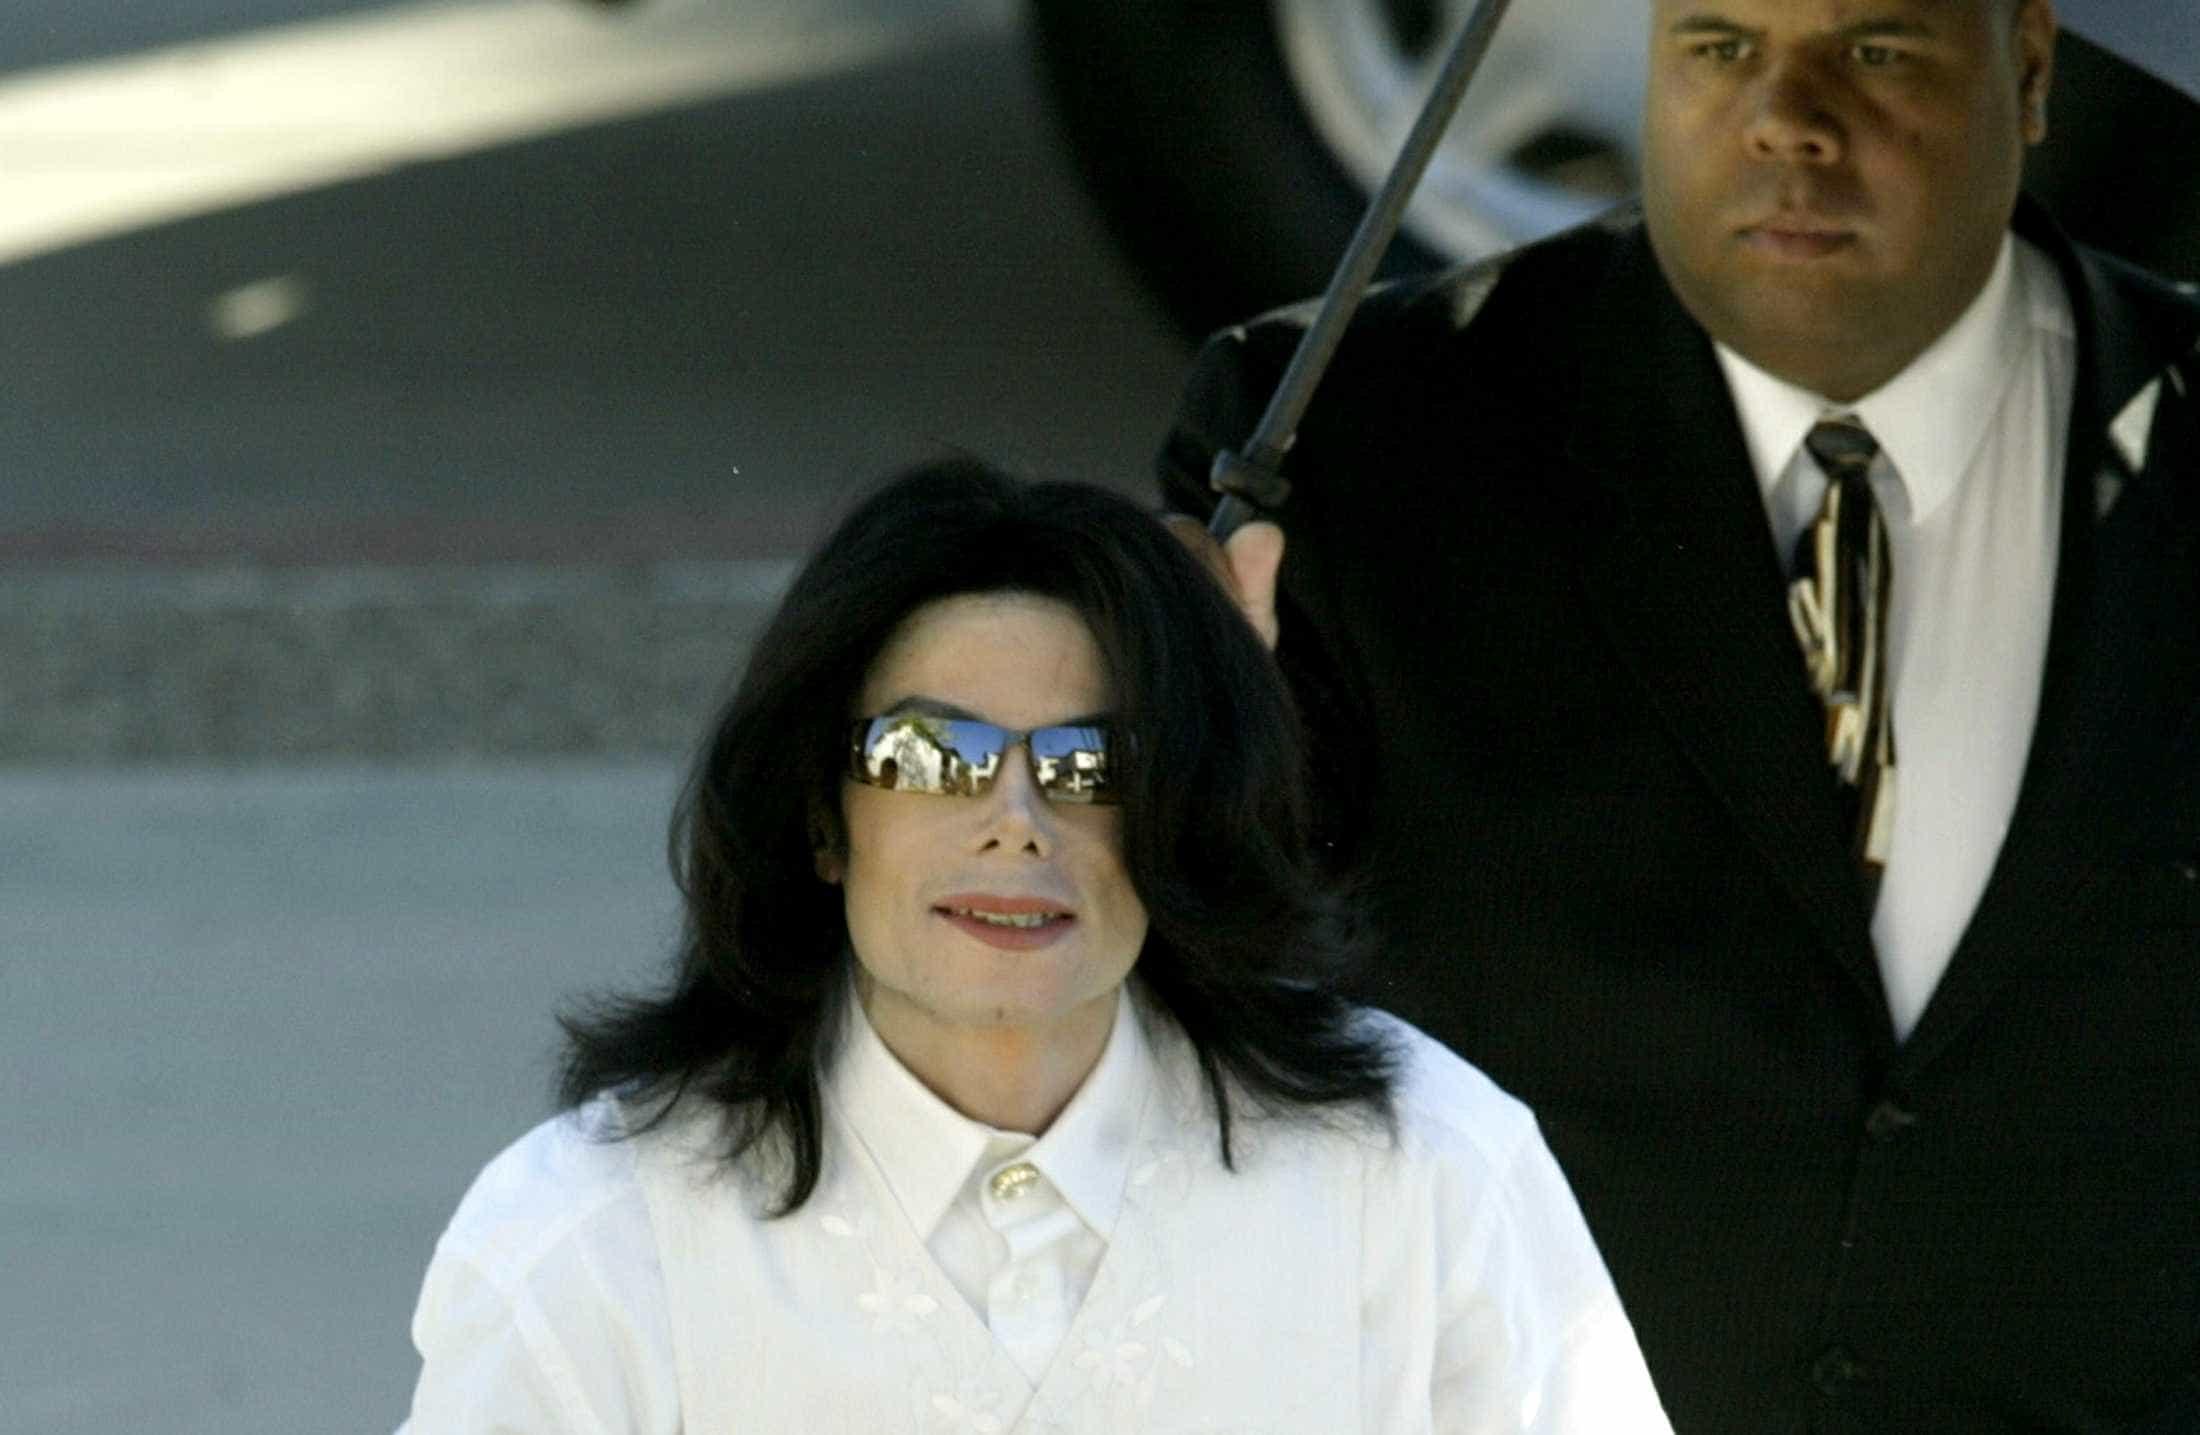 Rádio proíbe músicas de Michael Jackson após escândalo de pedofilia